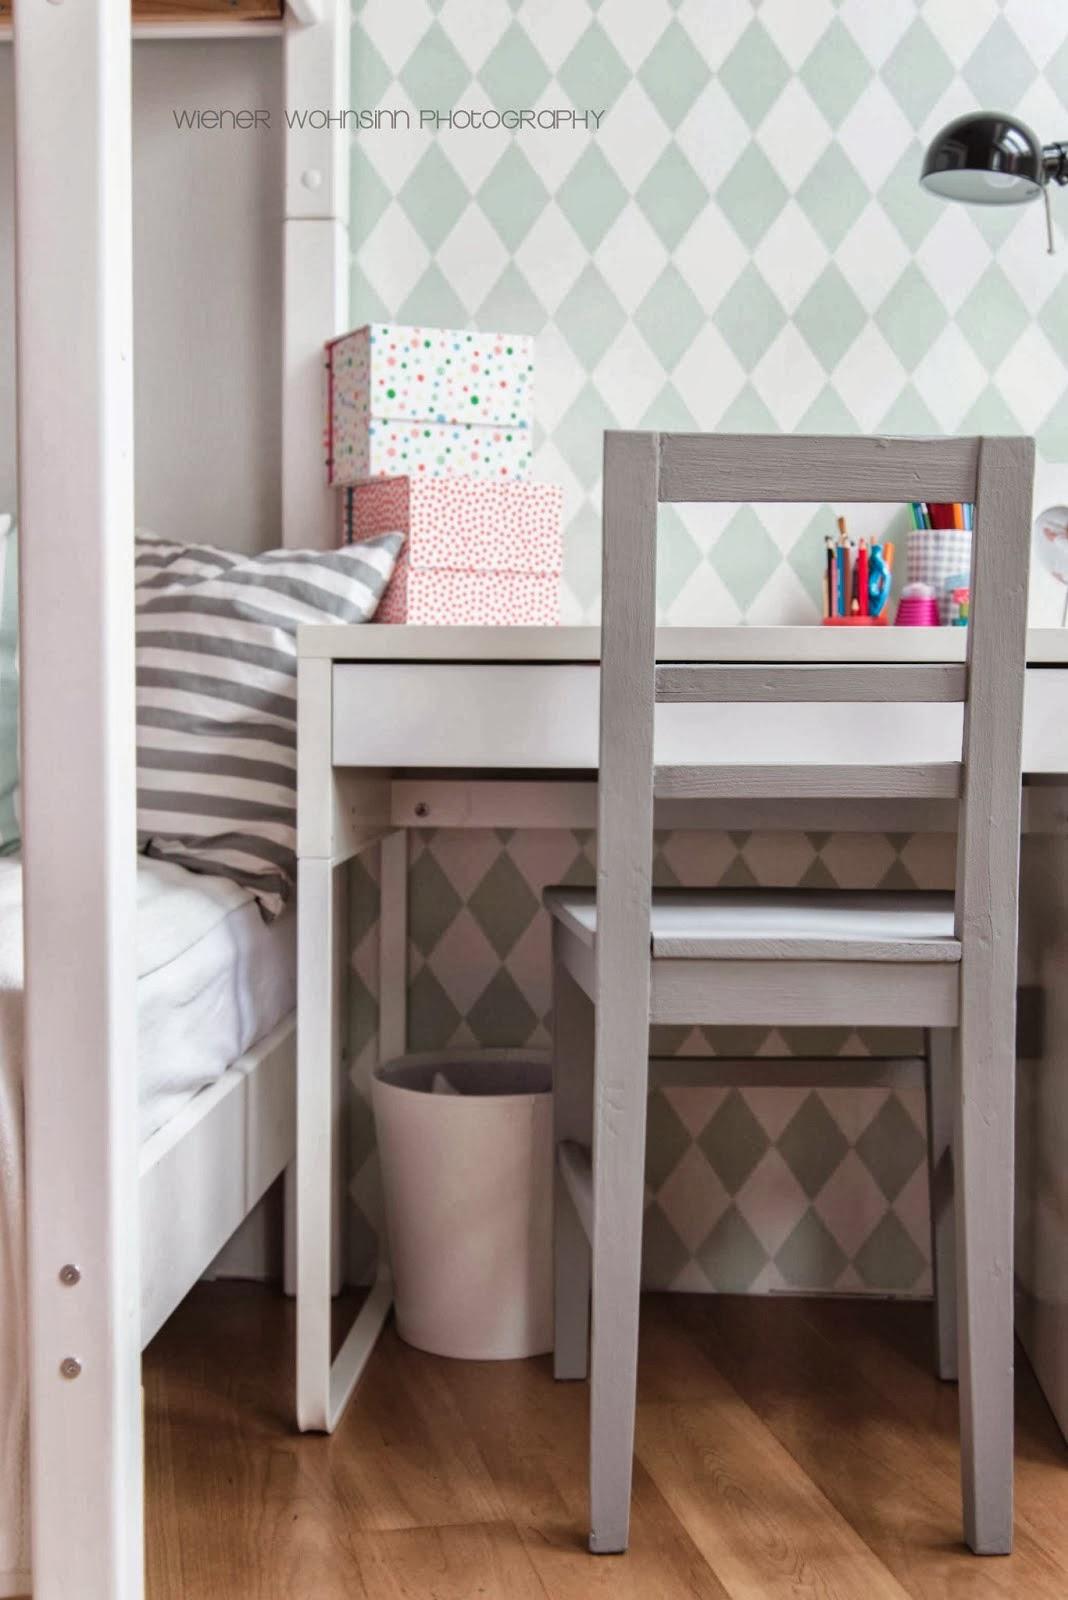 frauschmittblog kinderzimmer ideen kids 39 room ideas. Black Bedroom Furniture Sets. Home Design Ideas